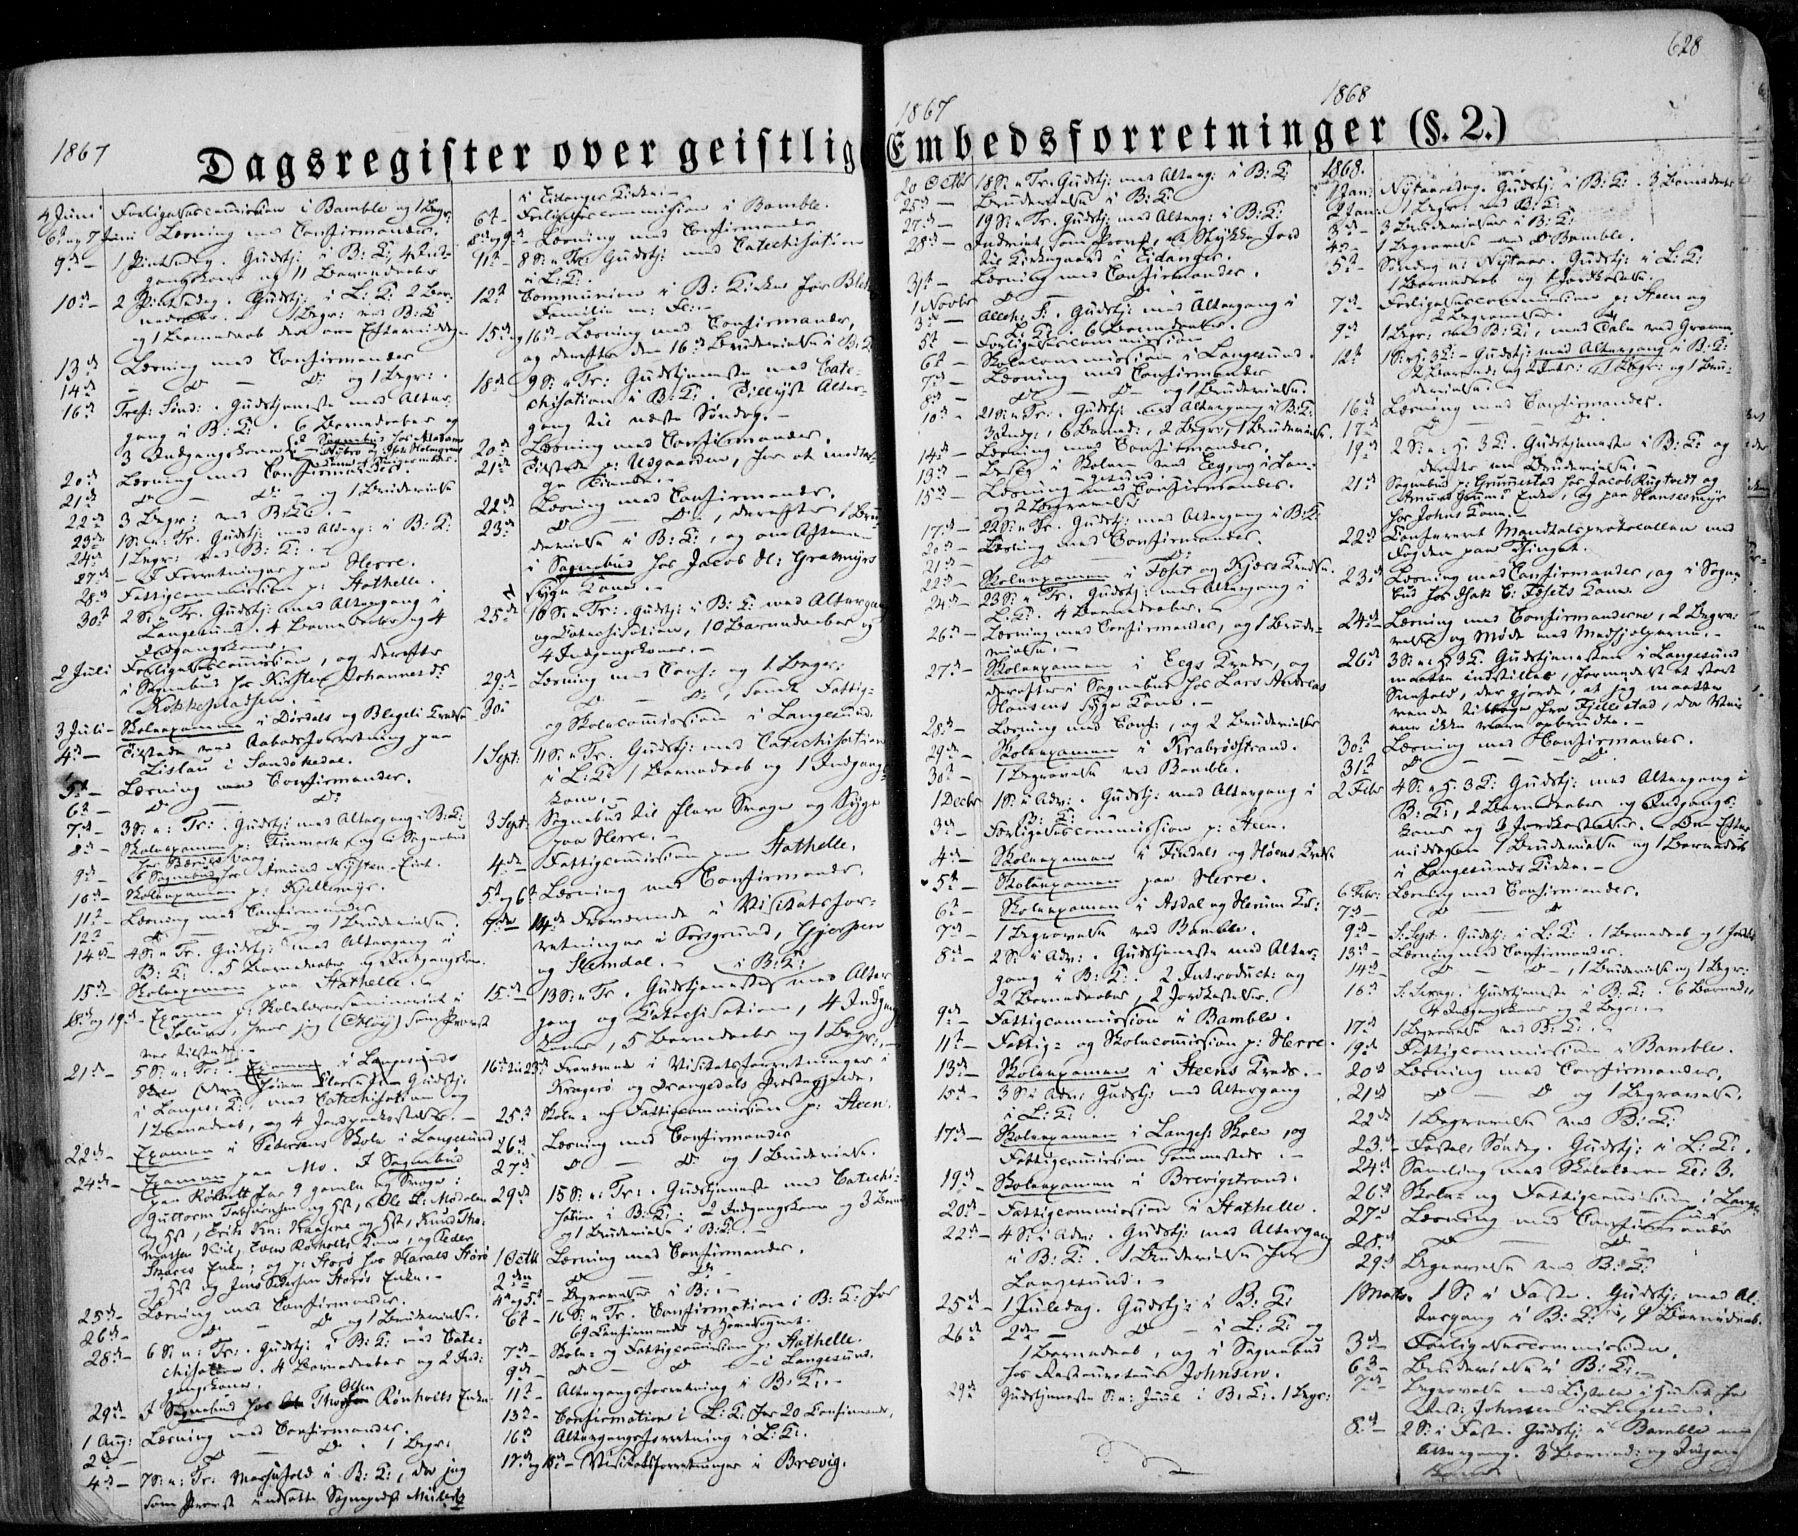 SAKO, Bamble kirkebøker, F/Fa/L0005: Ministerialbok nr. I 5, 1854-1869, s. 628